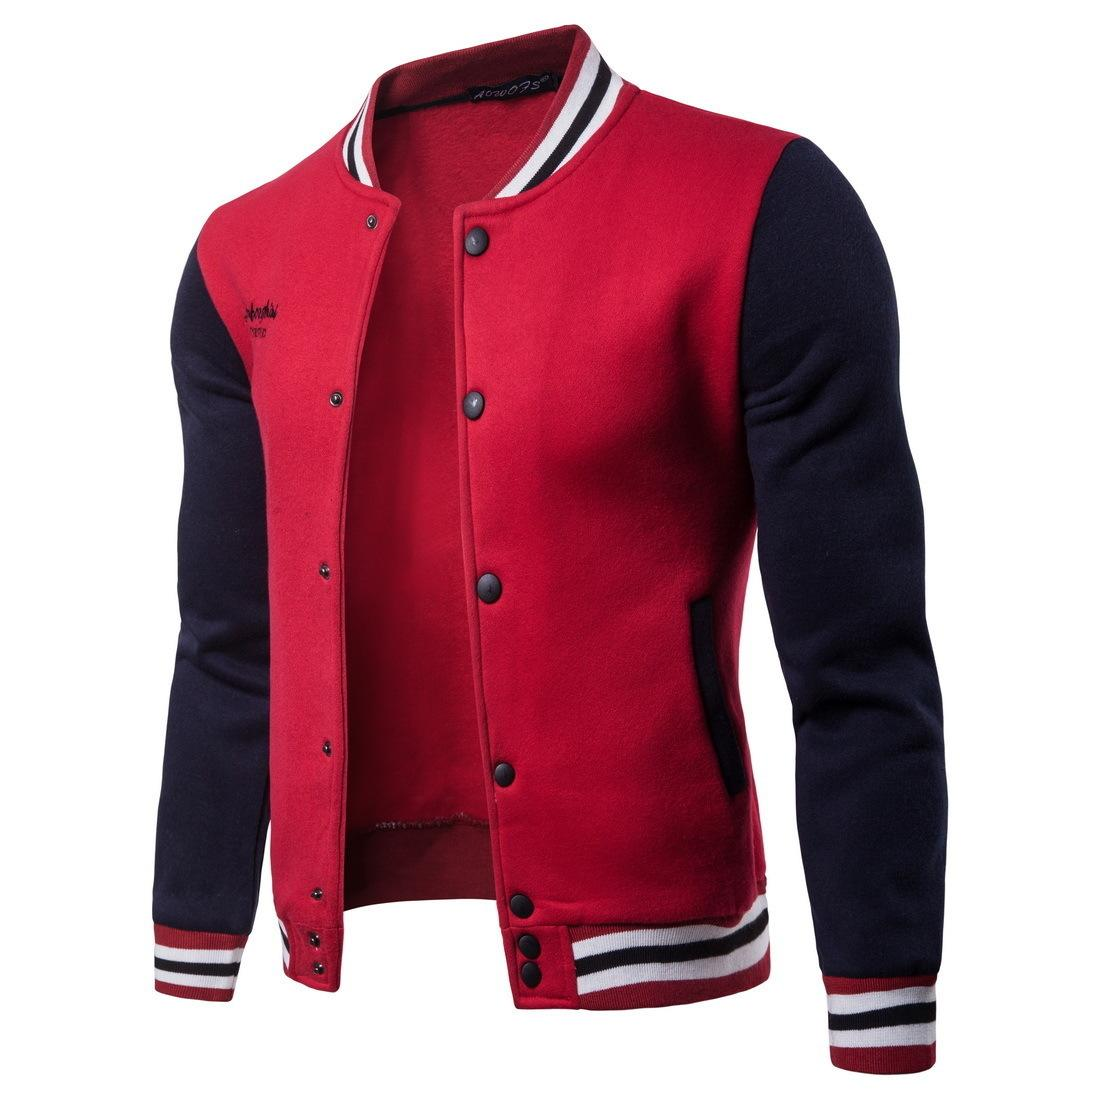 da551154 New Men Jacket Men 2019 Fashion Design Wine Red Mens Slim Fit College  Varsity Jacket Men Brand Stylish